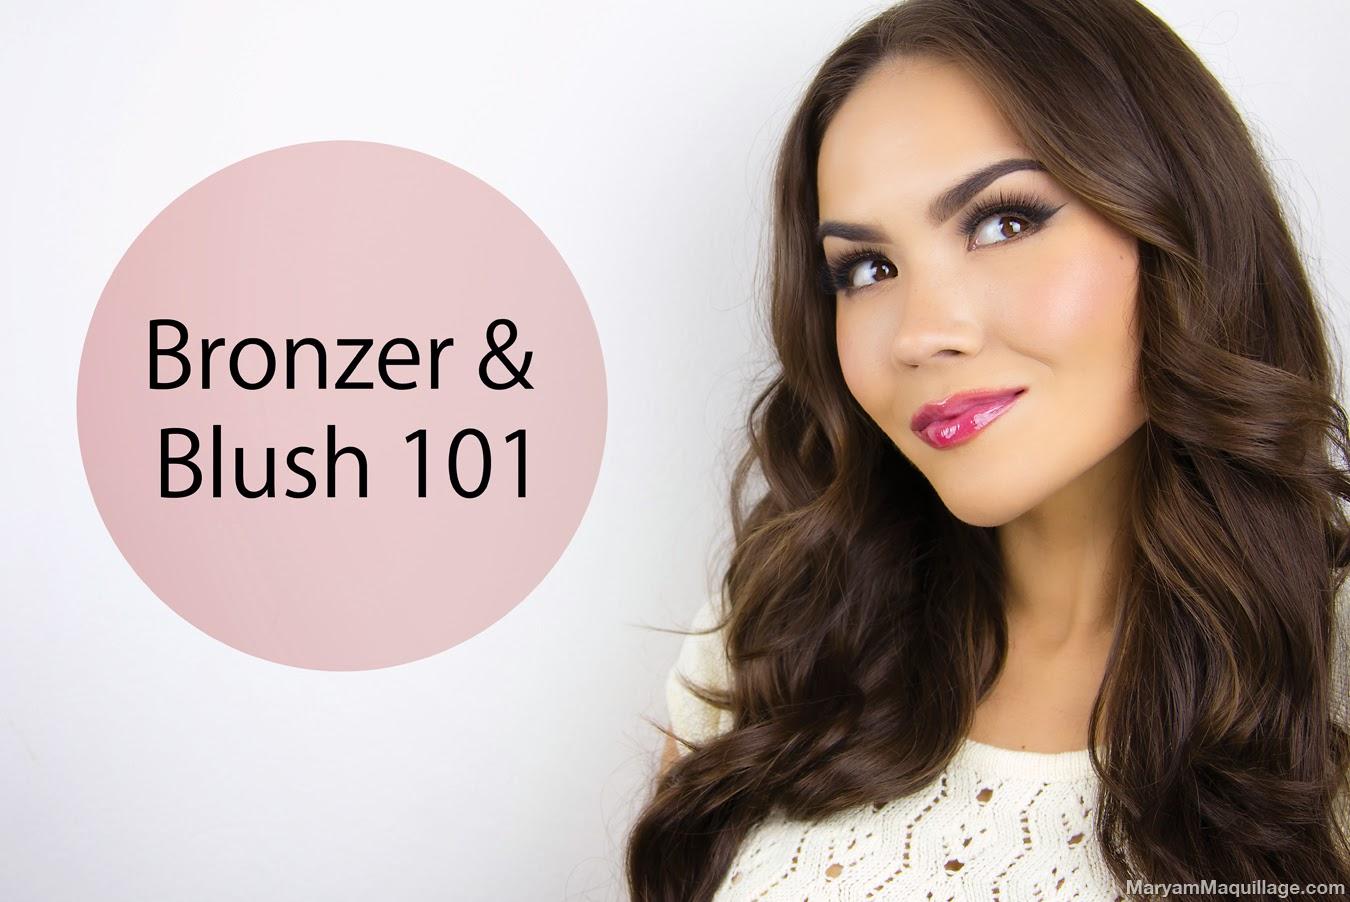 Maryam maquillage bronzer blush 101 video tutorial baditri Choice Image